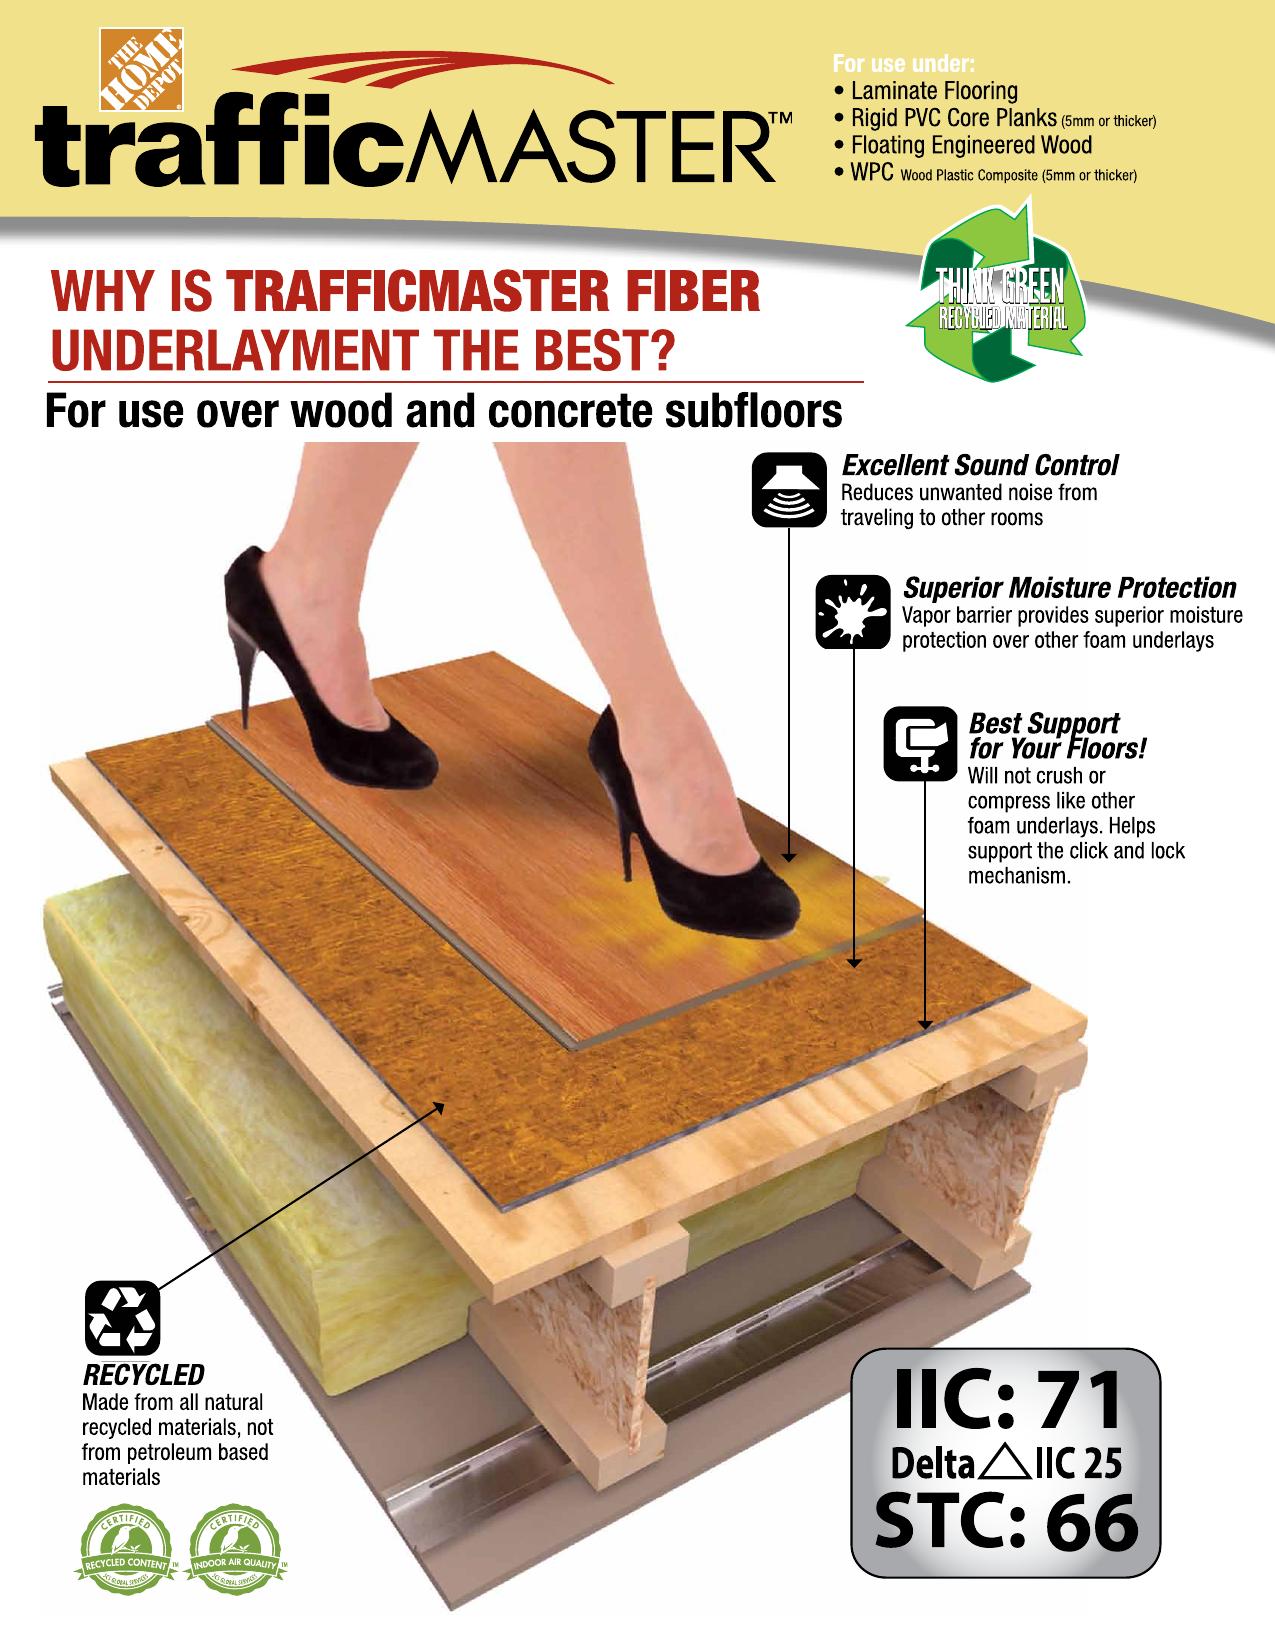 Vapor Barrier For Laminate Flooring, Laminate Flooring With Moisture Barrier Attached